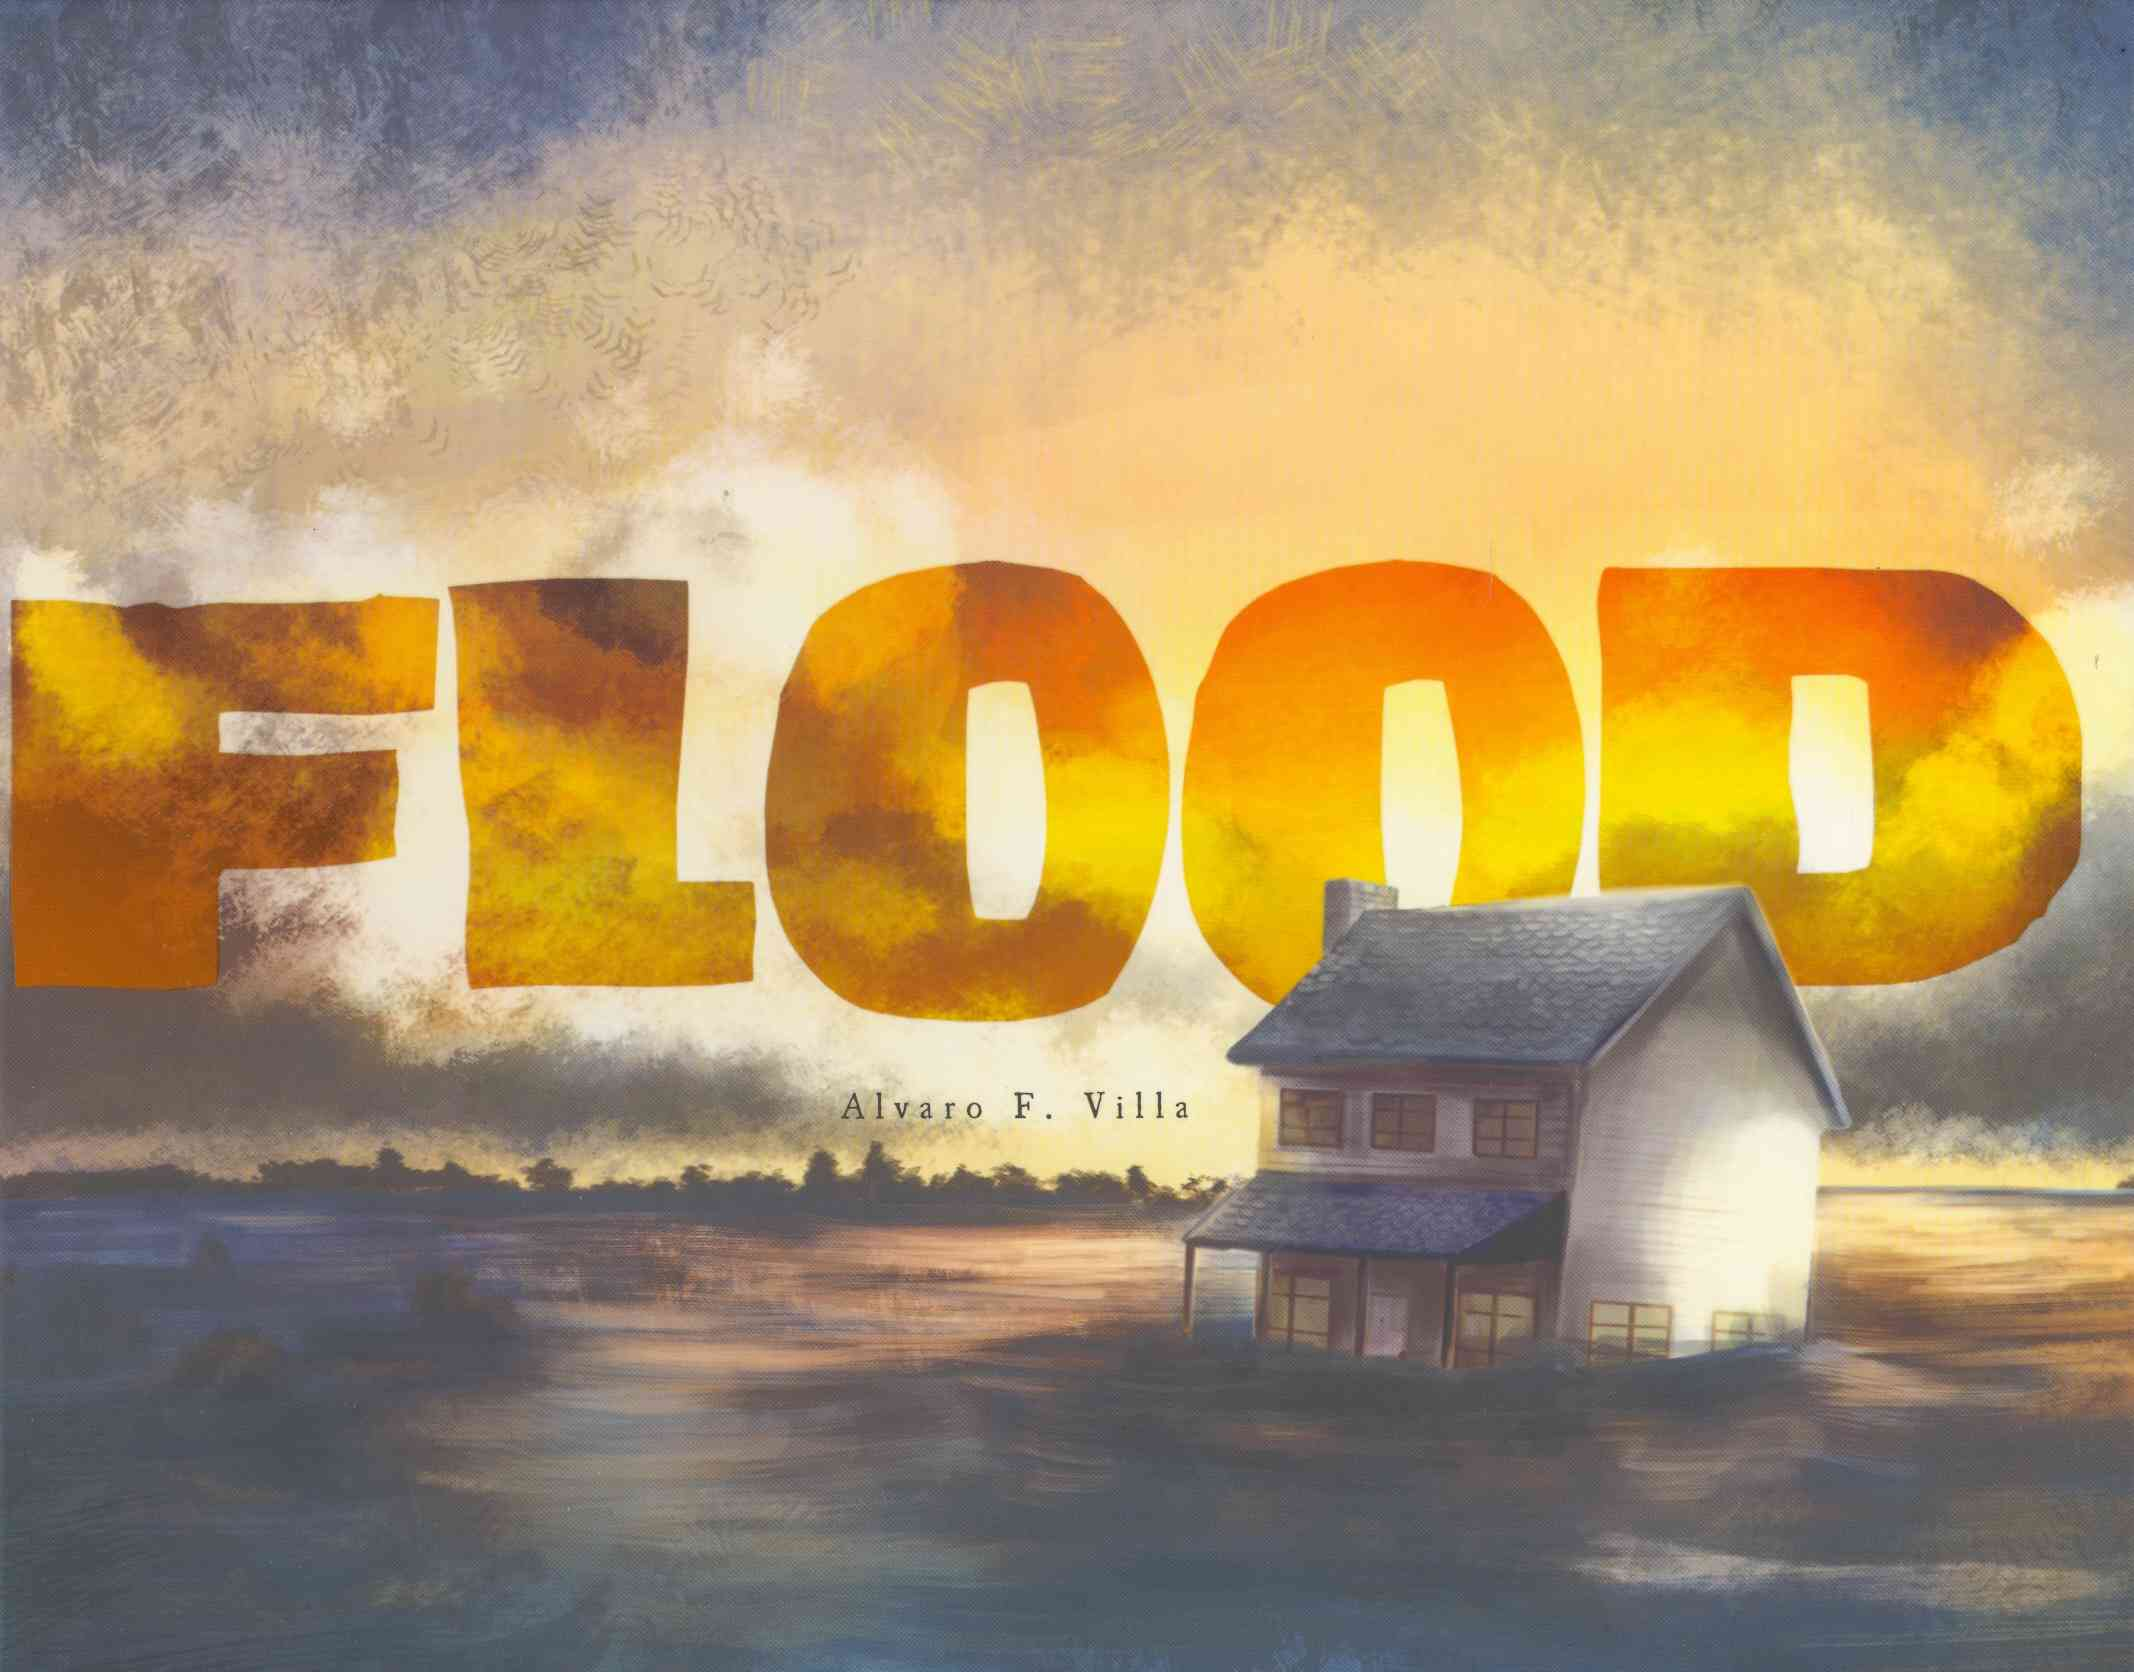 Flood By F. Villa, Alvaro